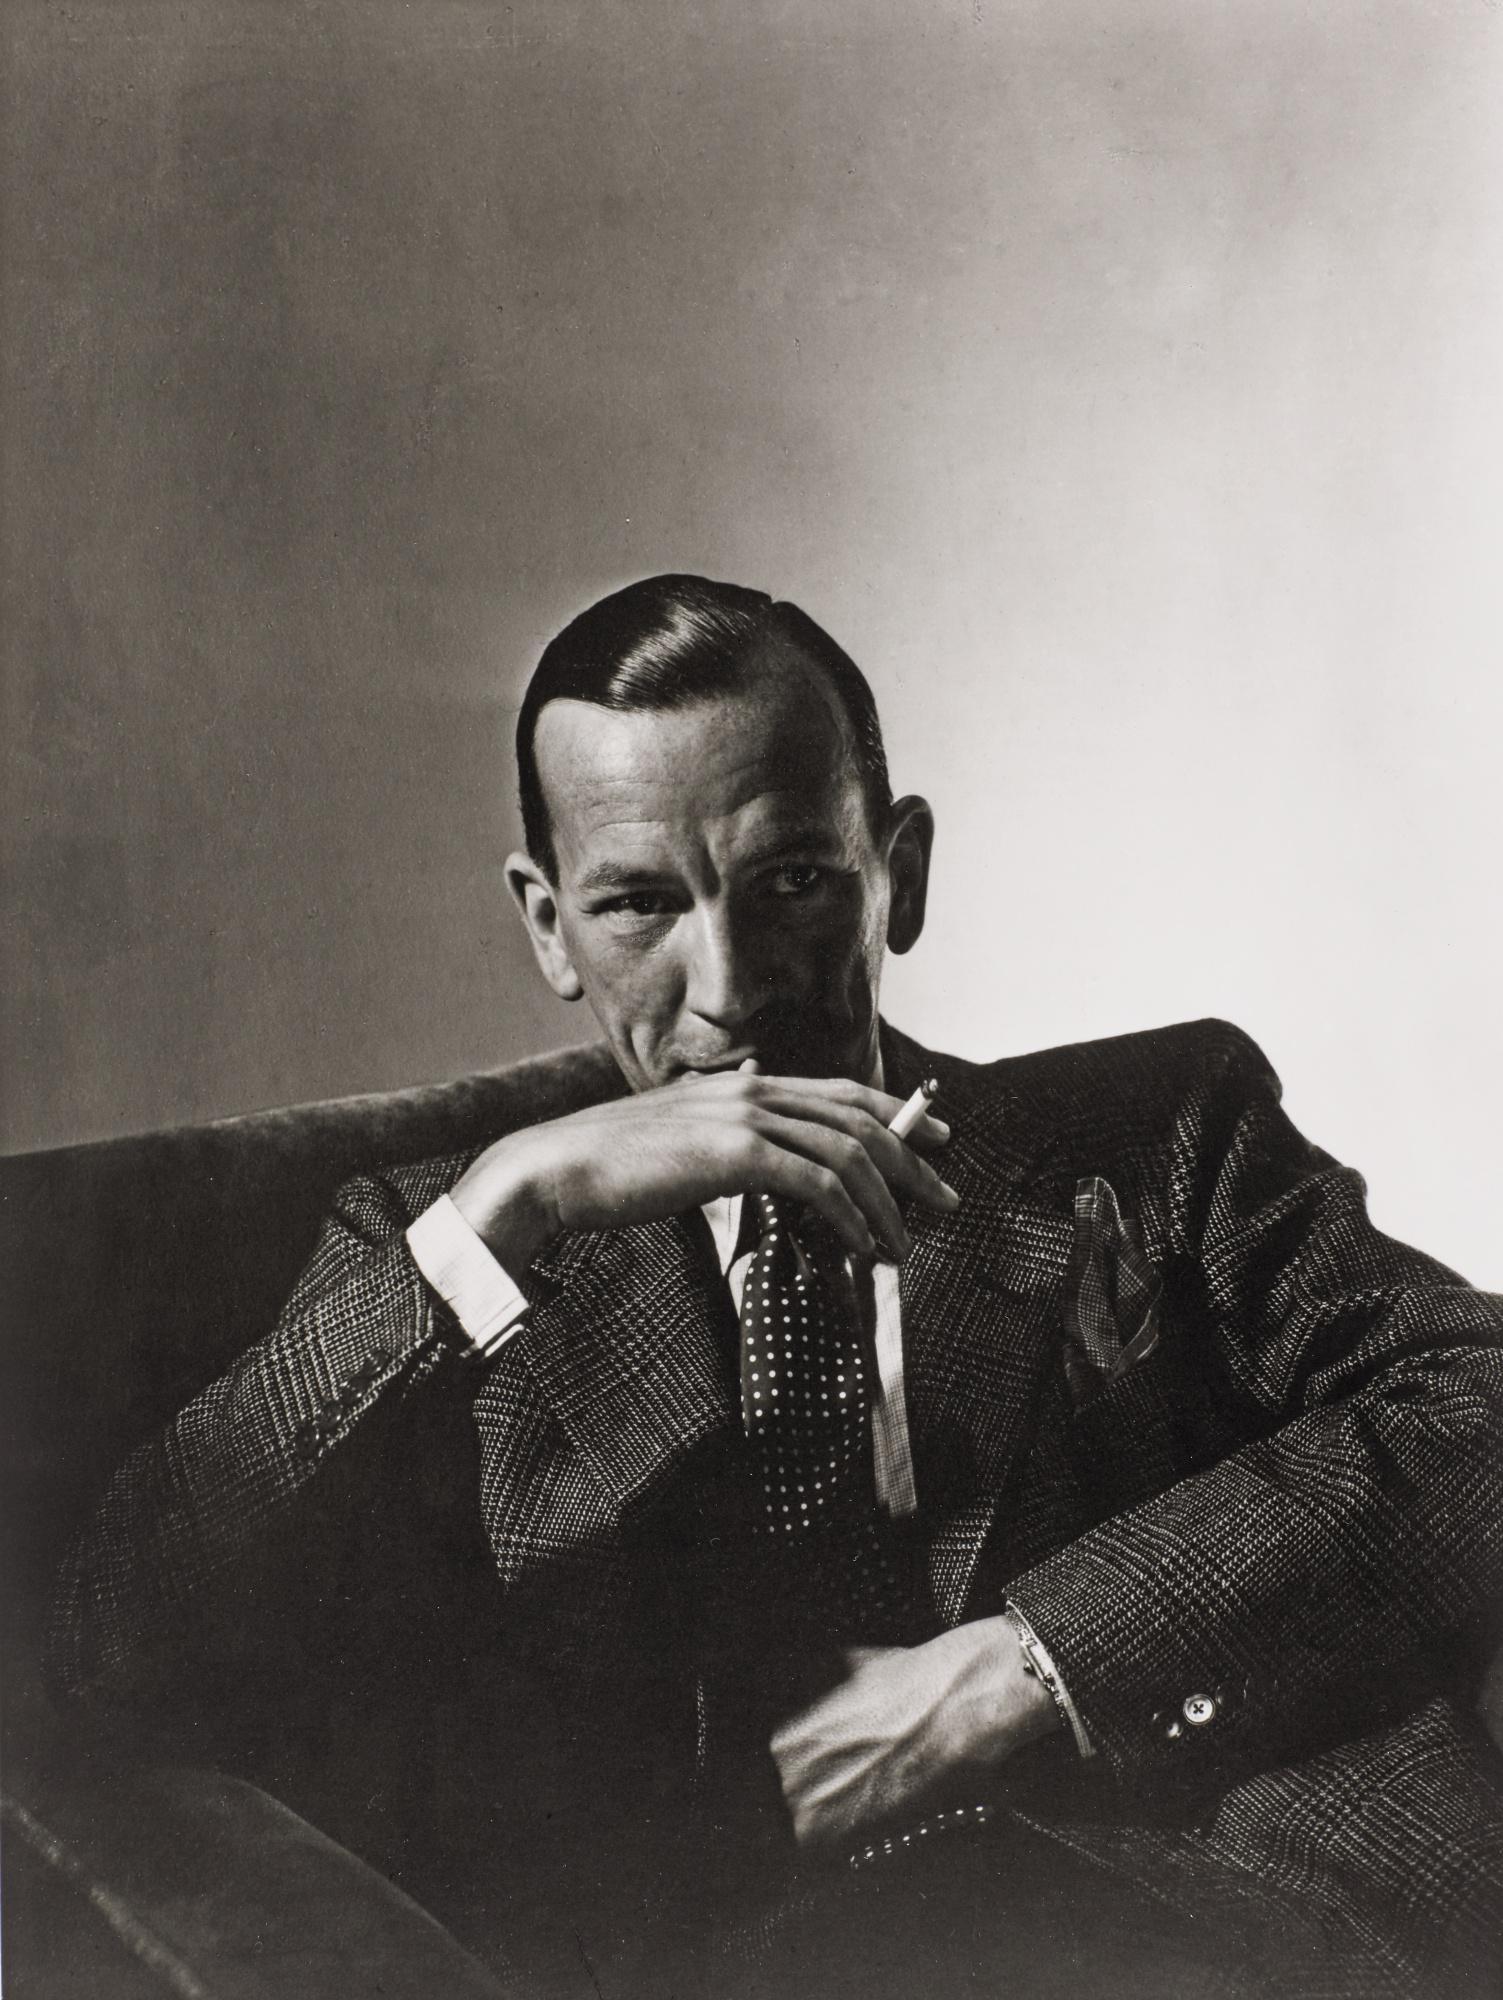 HORST P. HORST | NOEL COWARD, PARIS, 1937